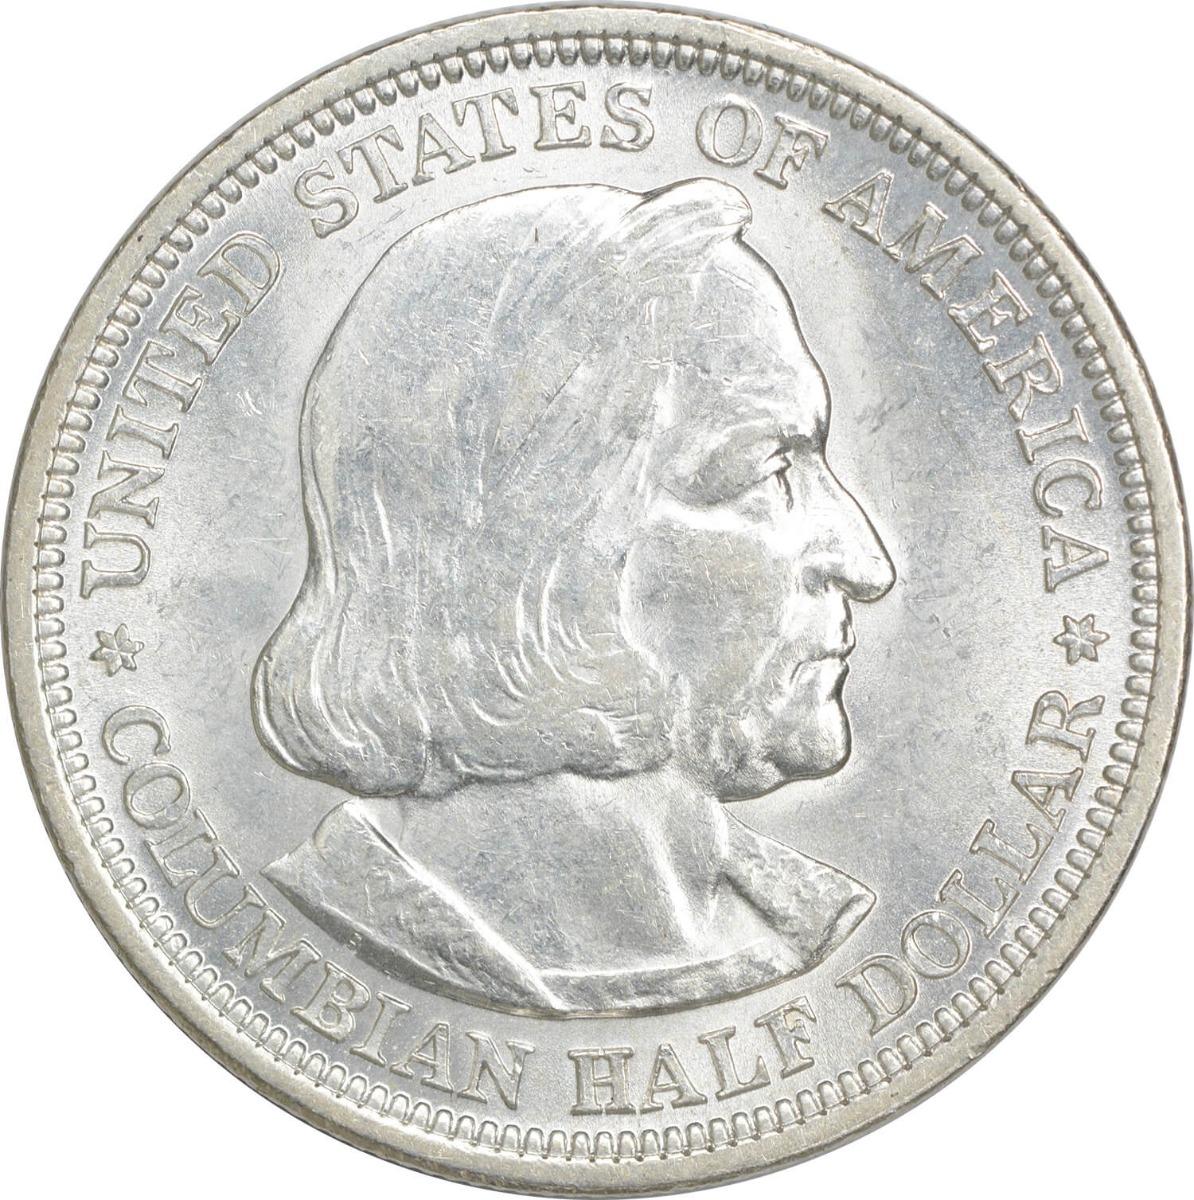 Columbian Commemorative Half Dollar 1893, MS63, Uncertified